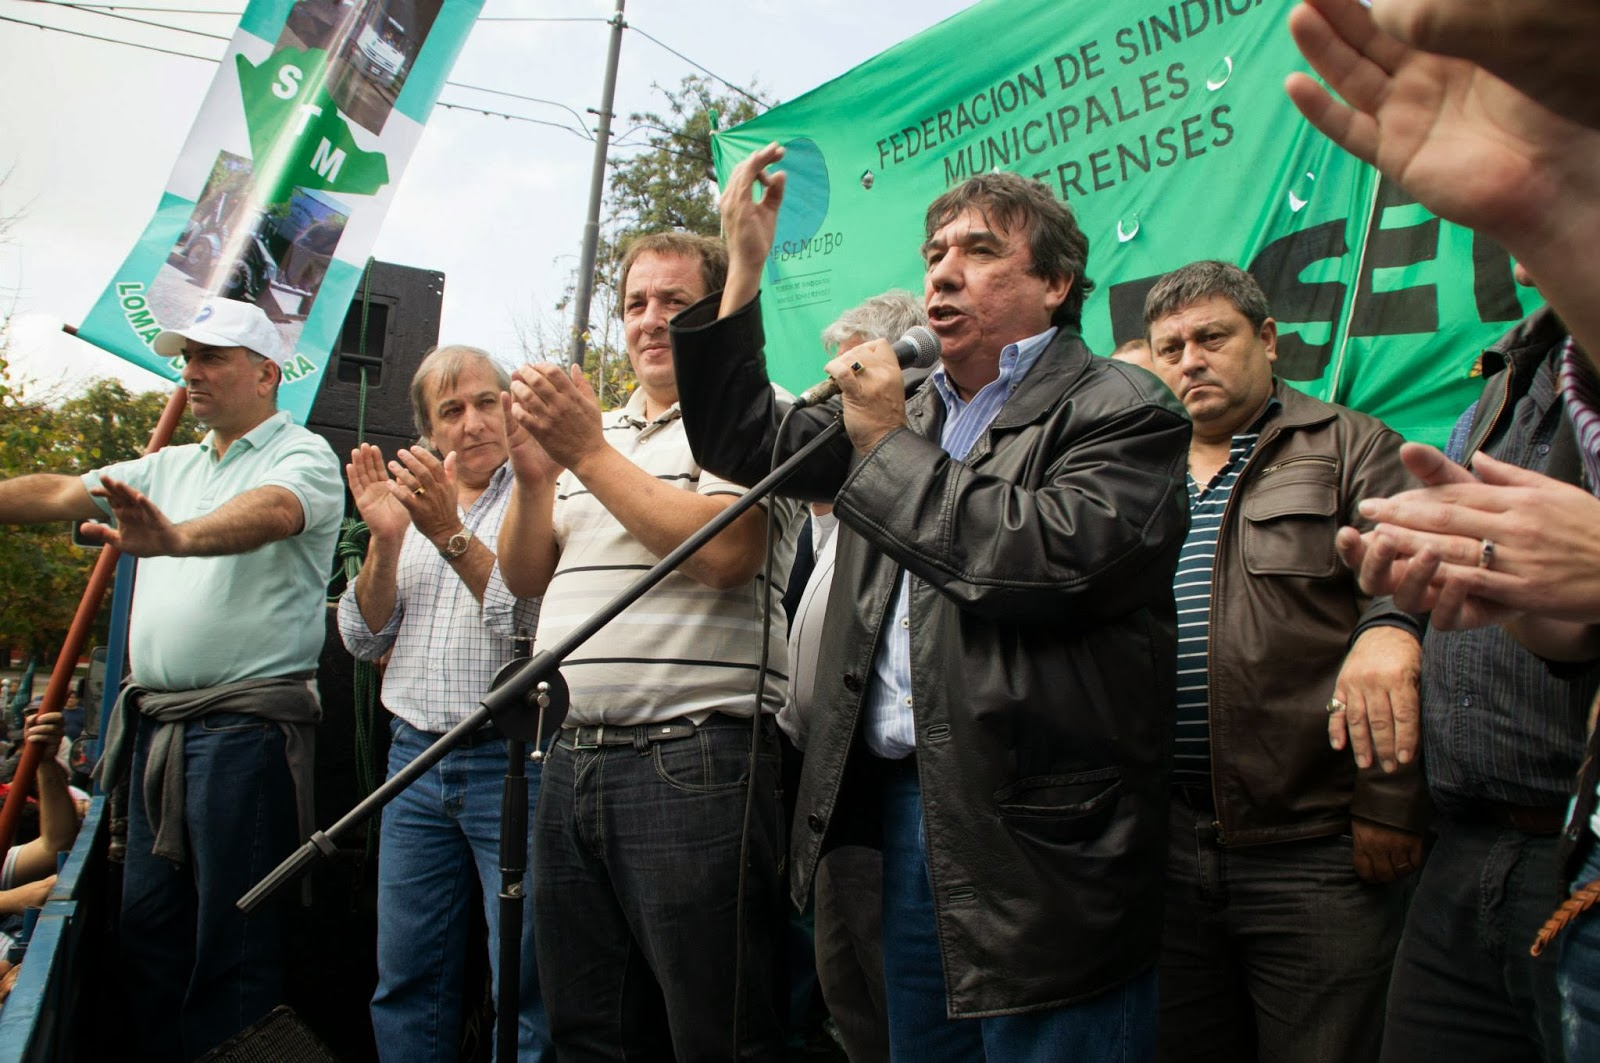 Municipales bonaerenses en busca de sus paritarias